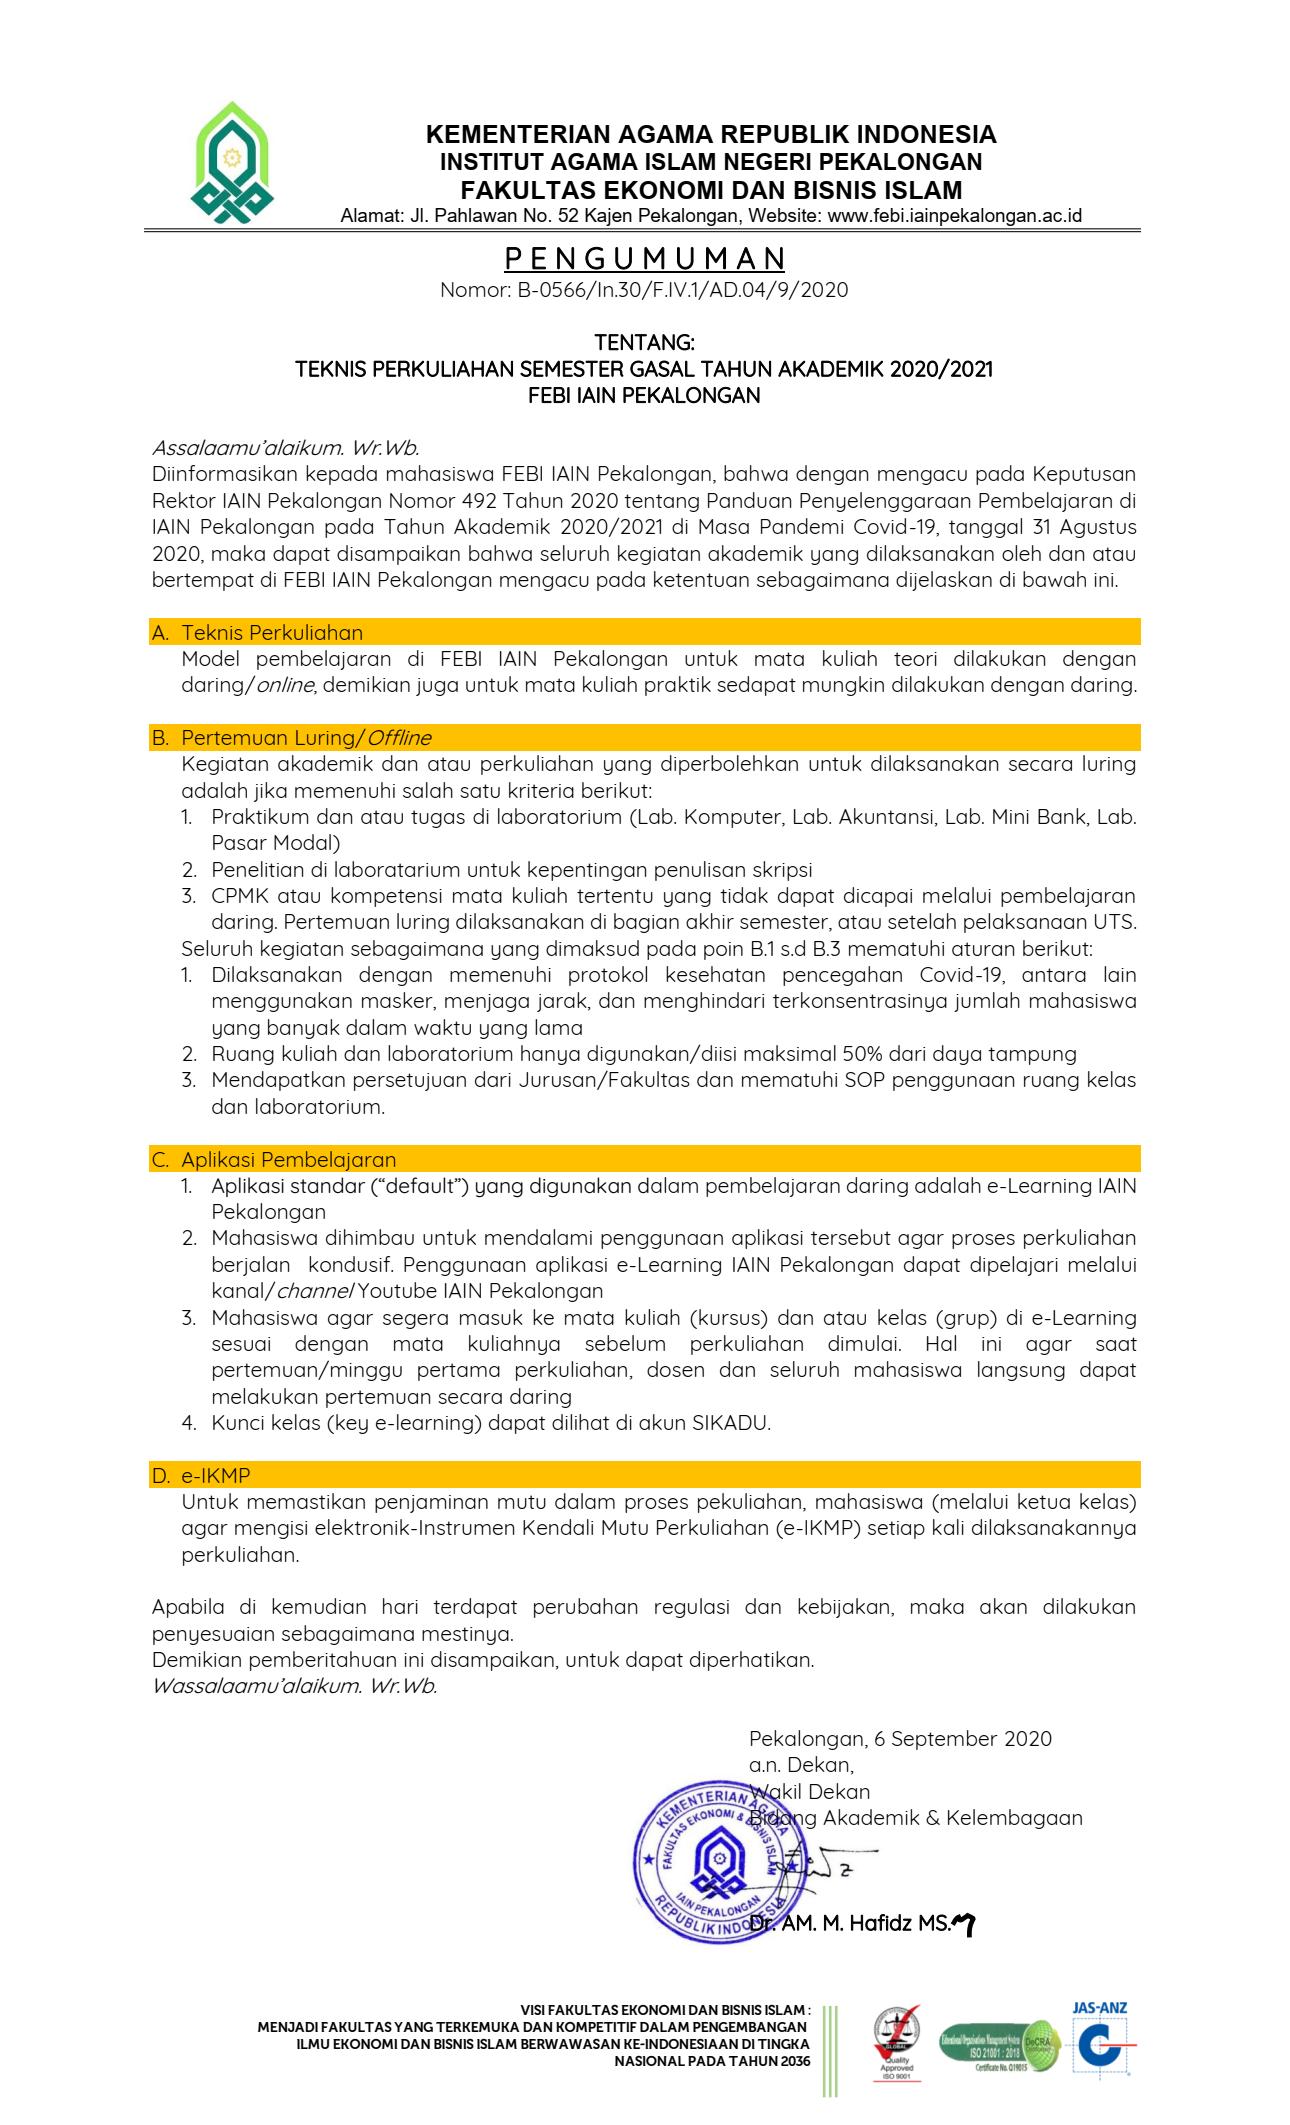 SURAT-PENGUMUMAN-TEKNIS-PERKULIAHAN-SEMT-GASAL-20-21-MHSW